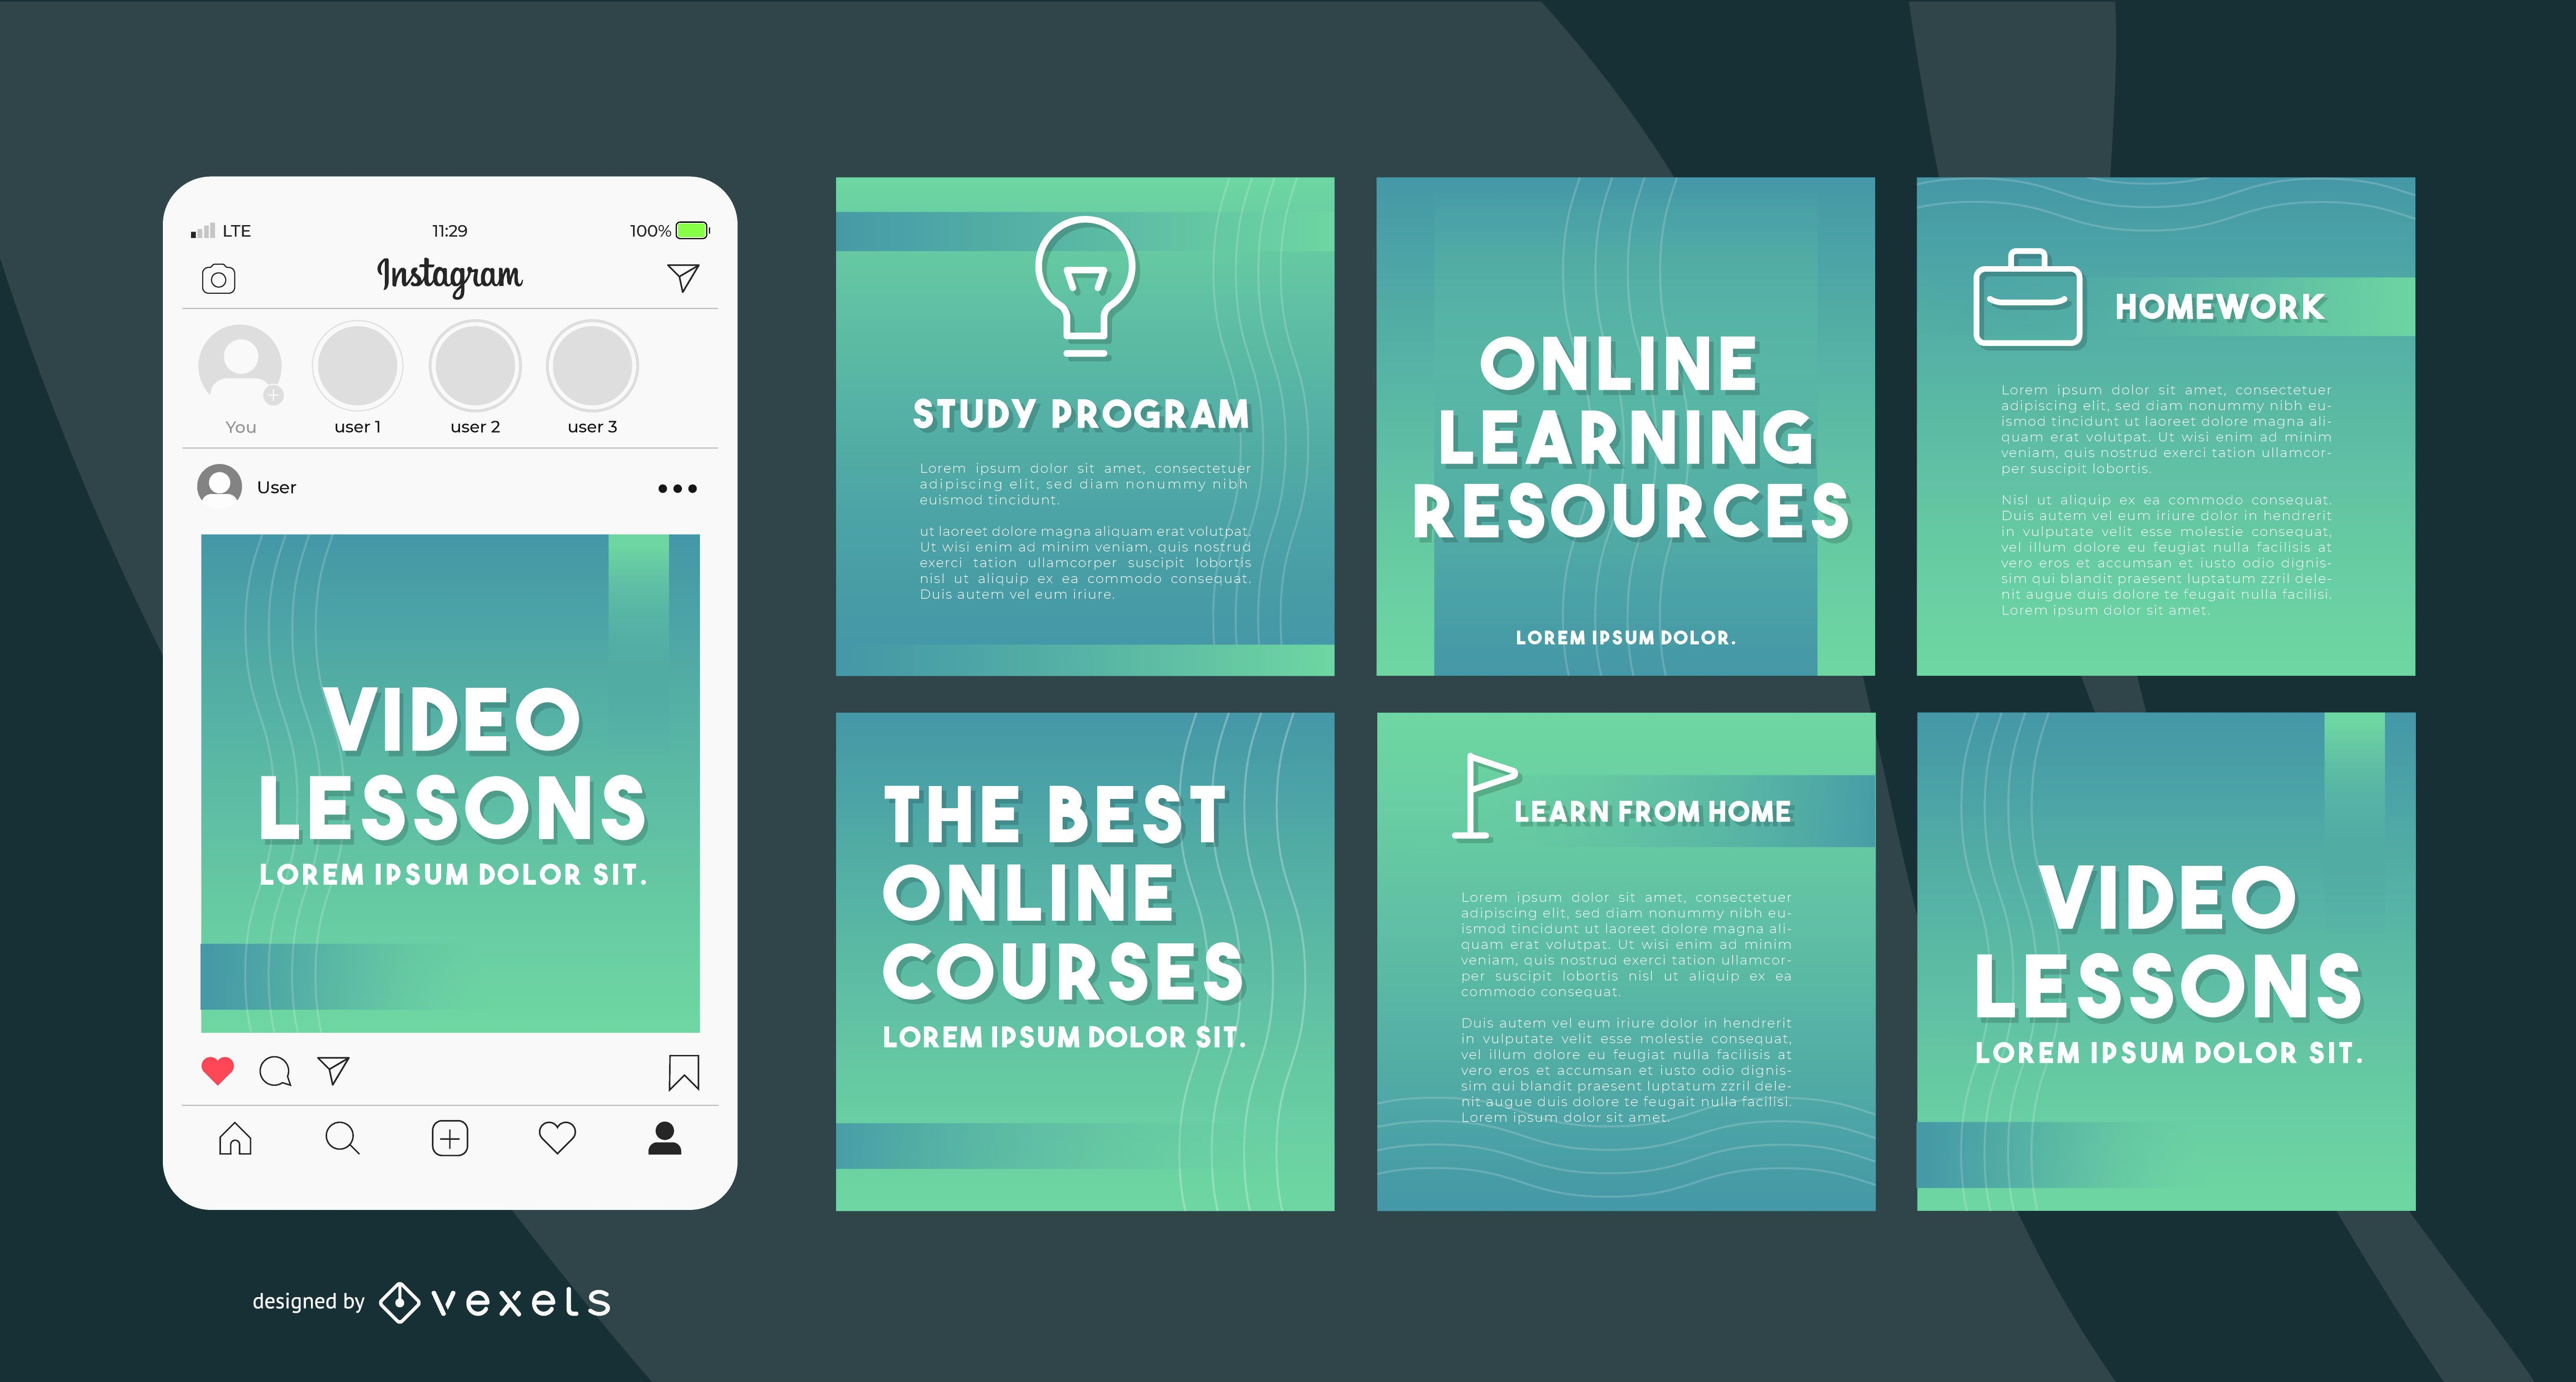 Modelos de mídia social de aprendizagem online